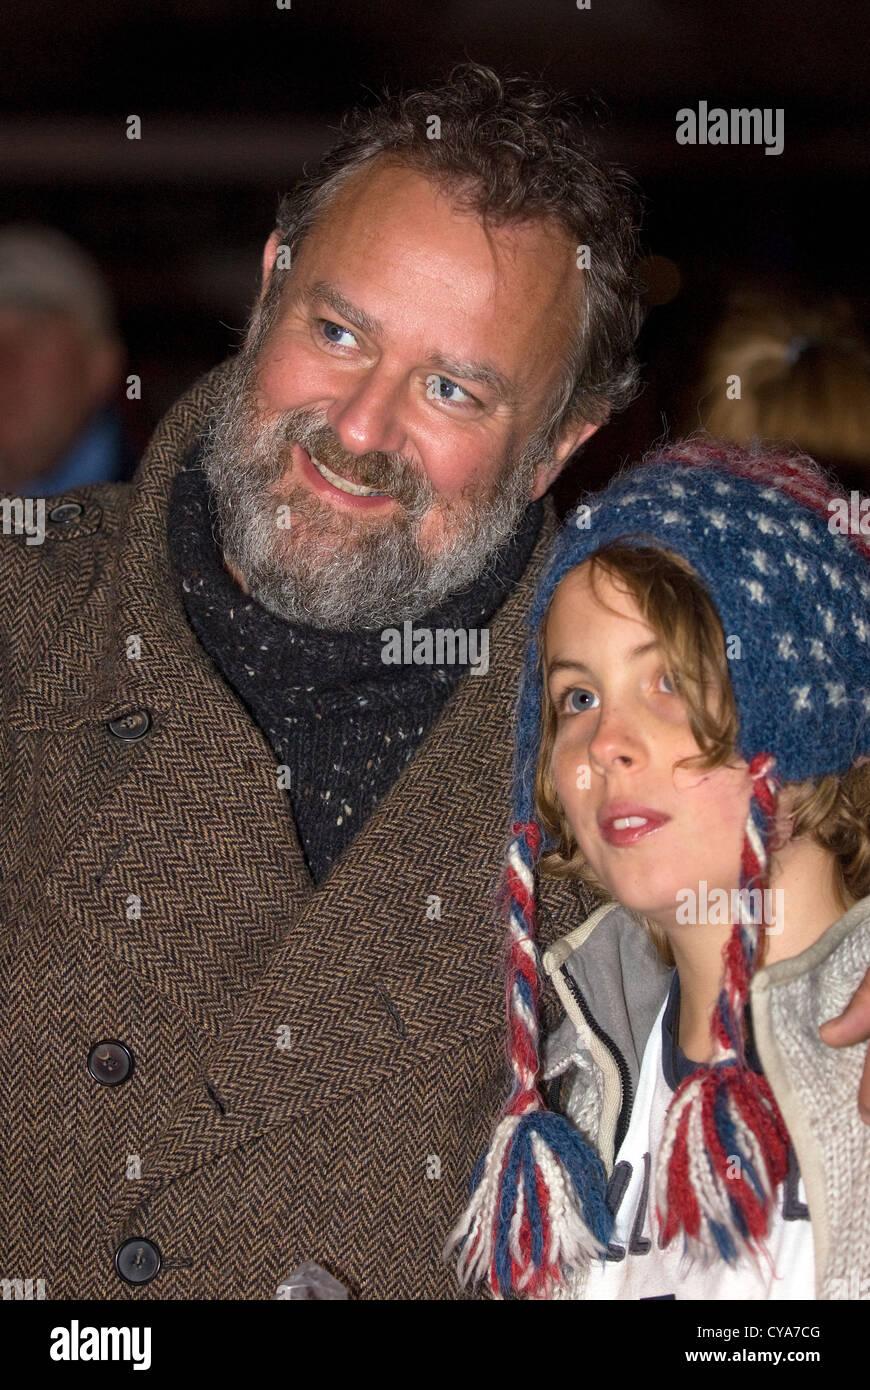 Liphook Carnival, Downton Abbey actor Hugh Bonneville in attendance, 27.10.2012. - Stock Image